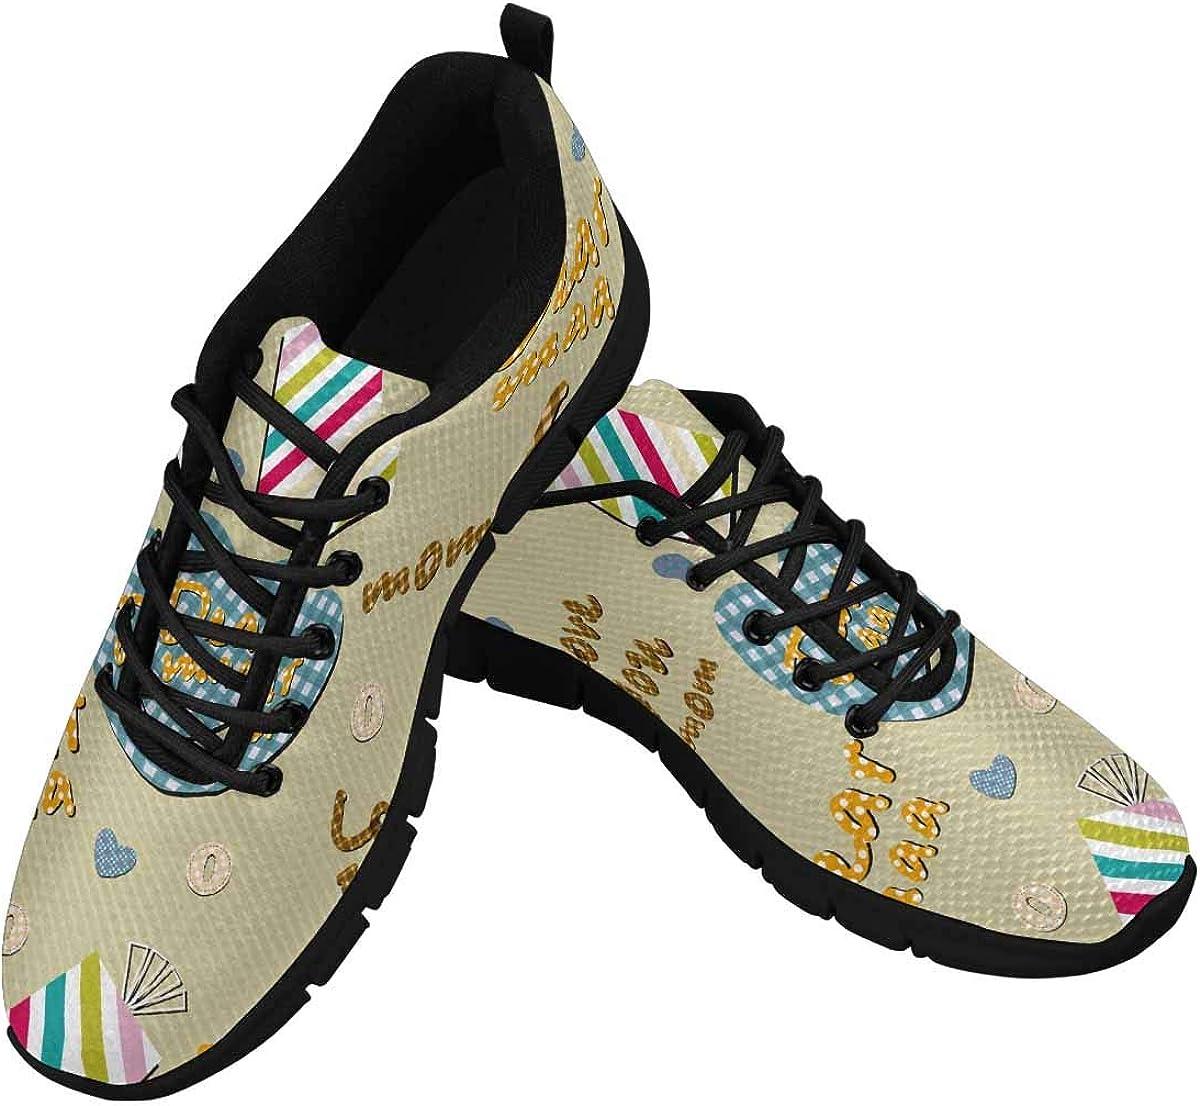 INTERESTPRINT Hearts Pattern Lightweight Mesh Breathable Sneakers for Women